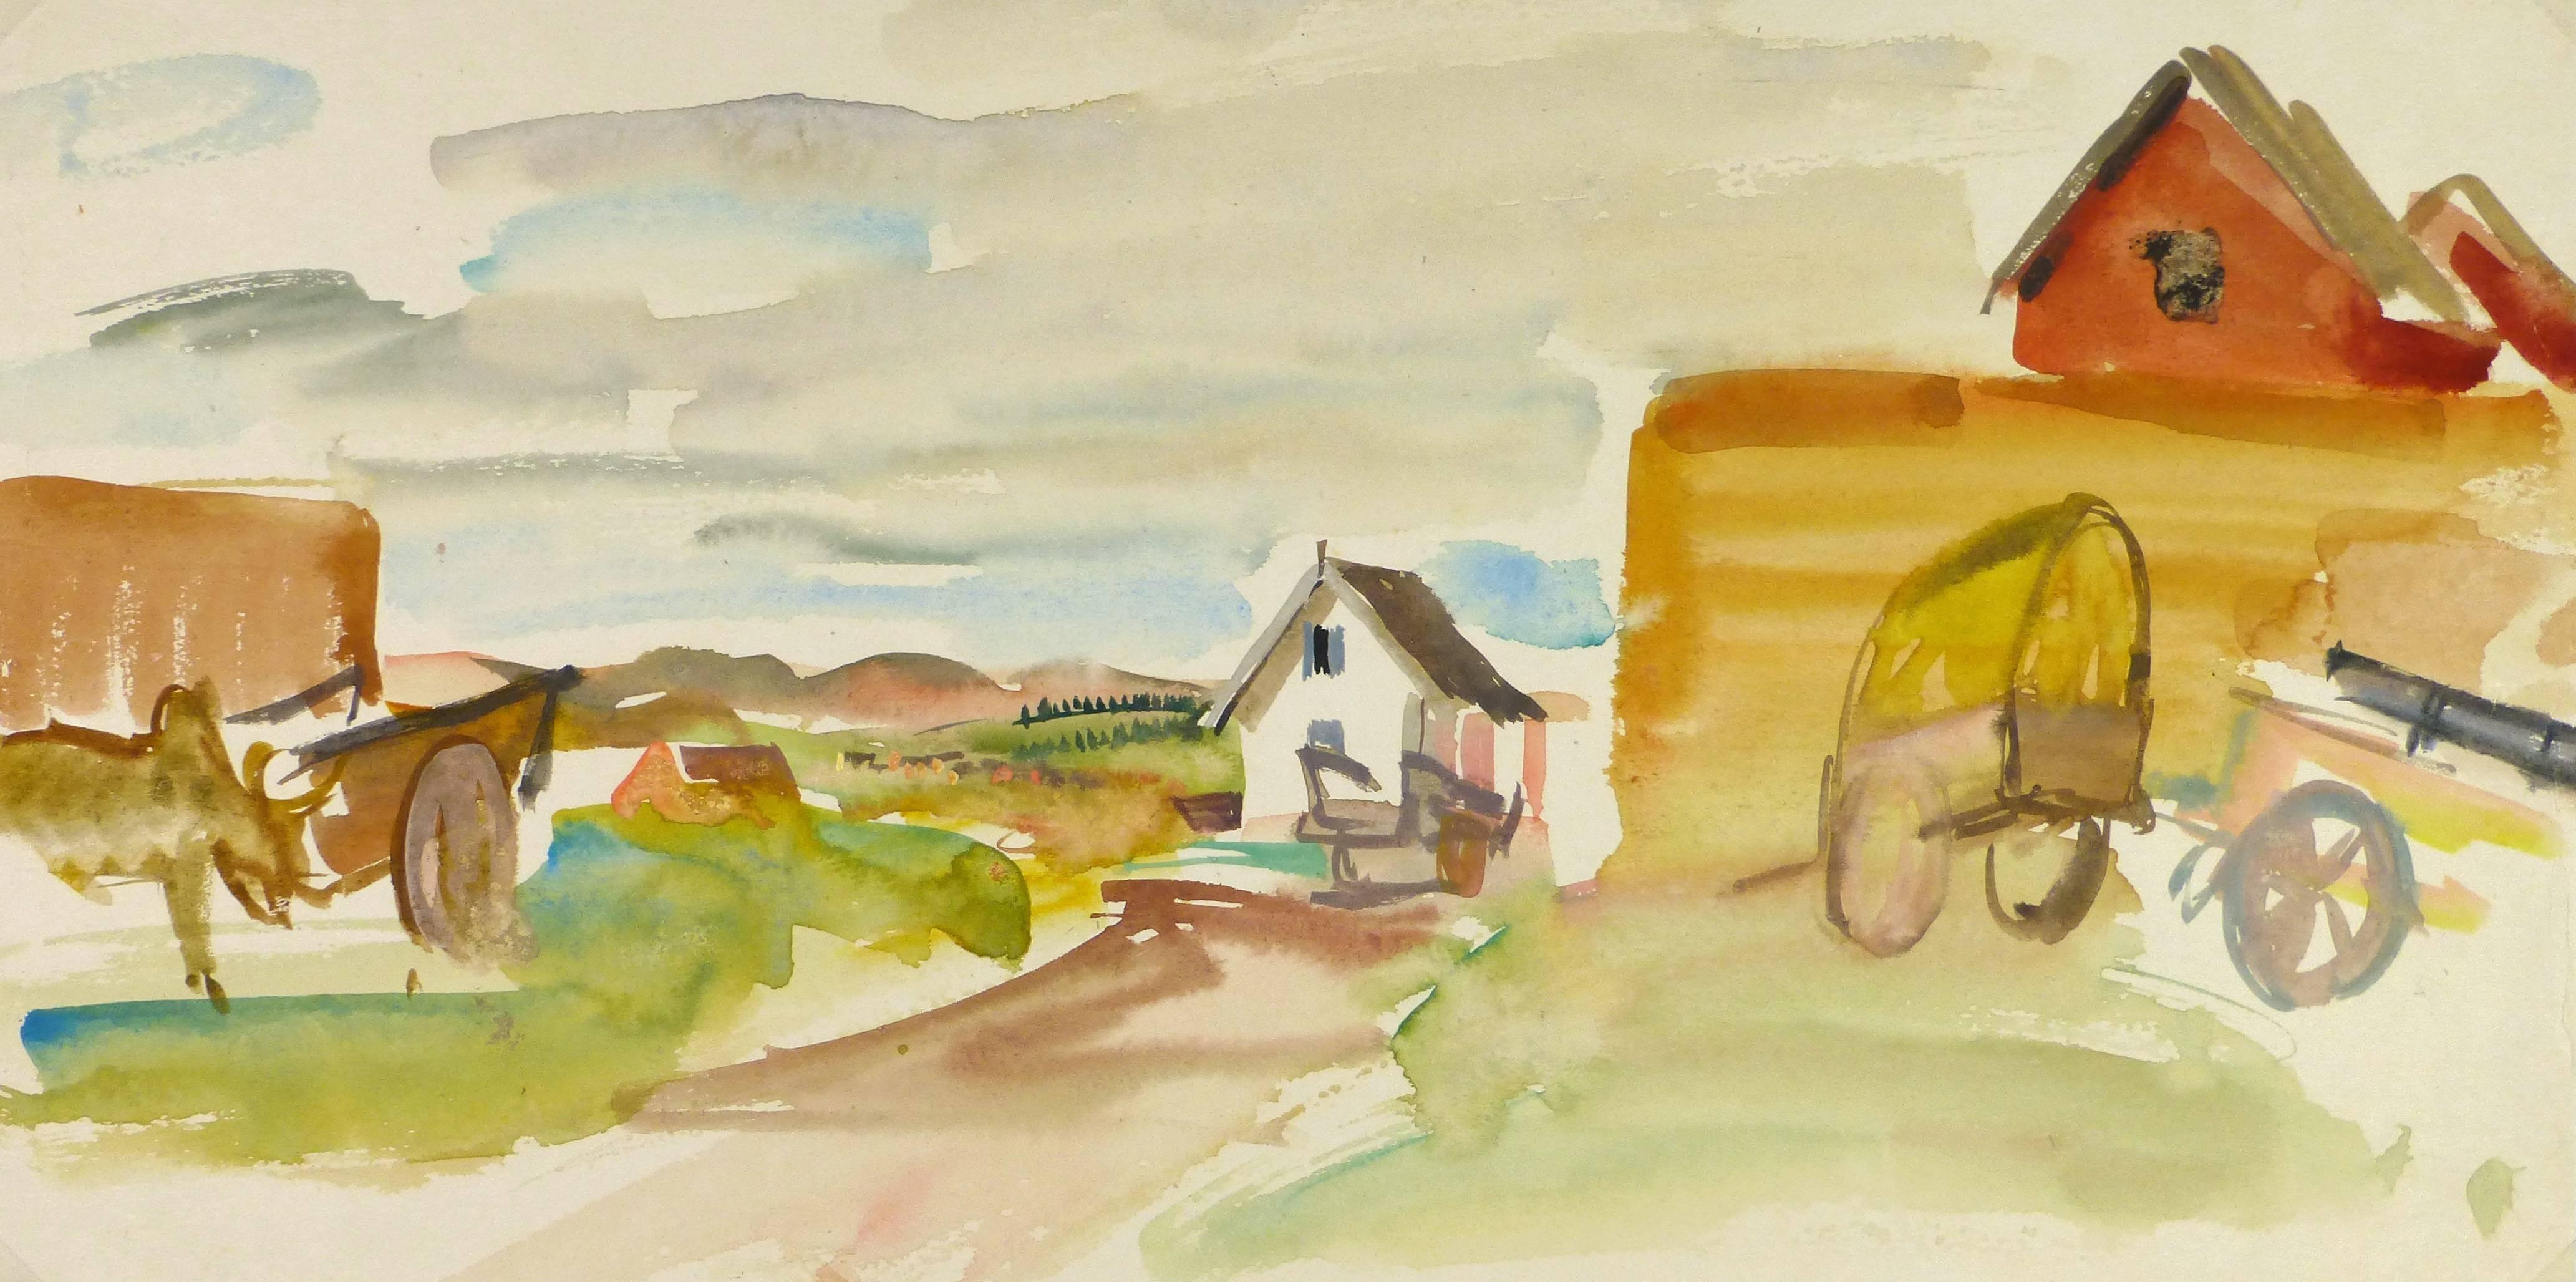 Serene Farm in Watercolors